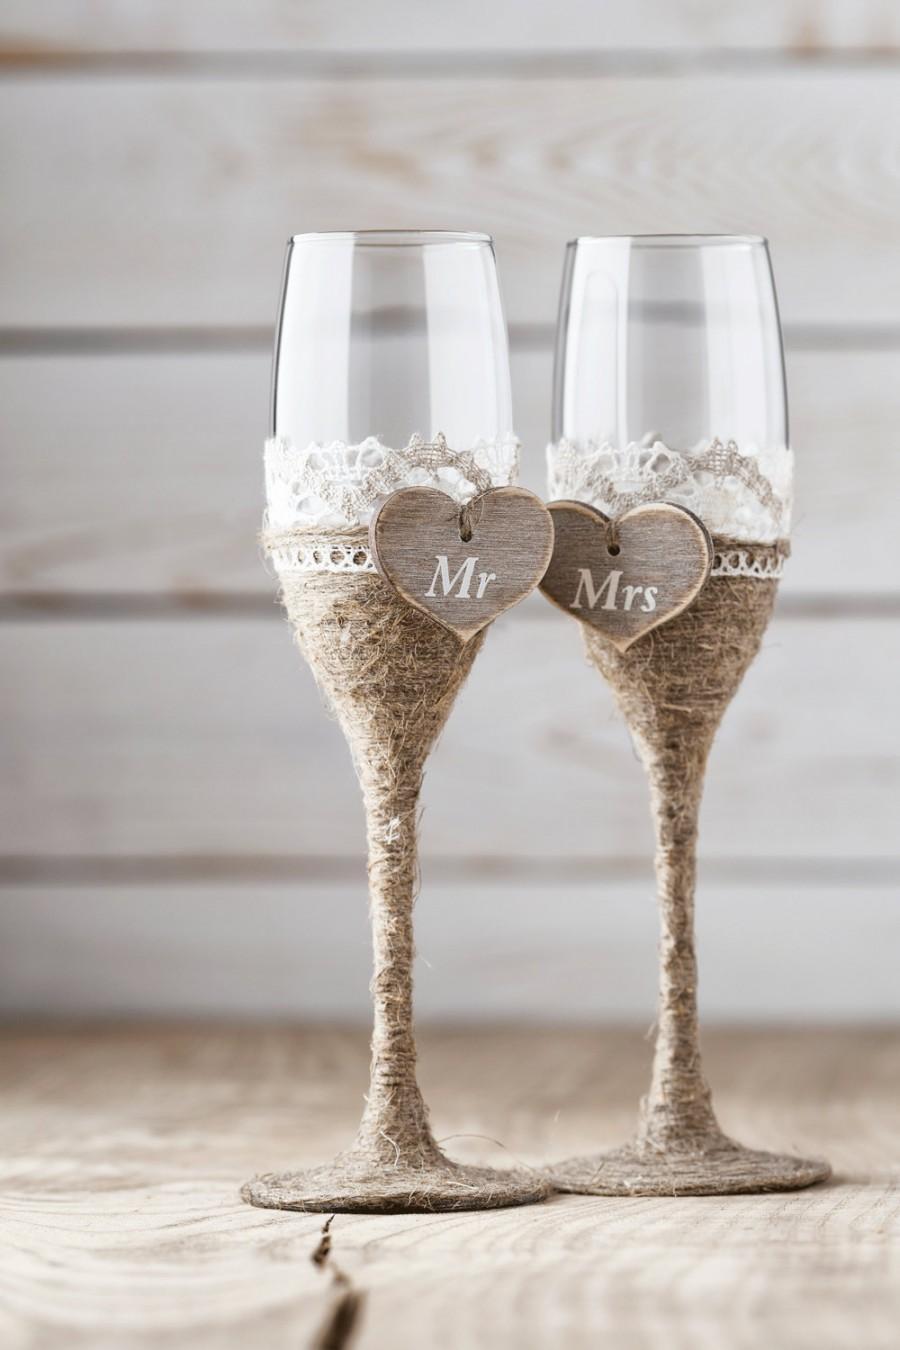 Wedding Toasting Glasses Rustic Toasting Flutes Wedding Champagne ...